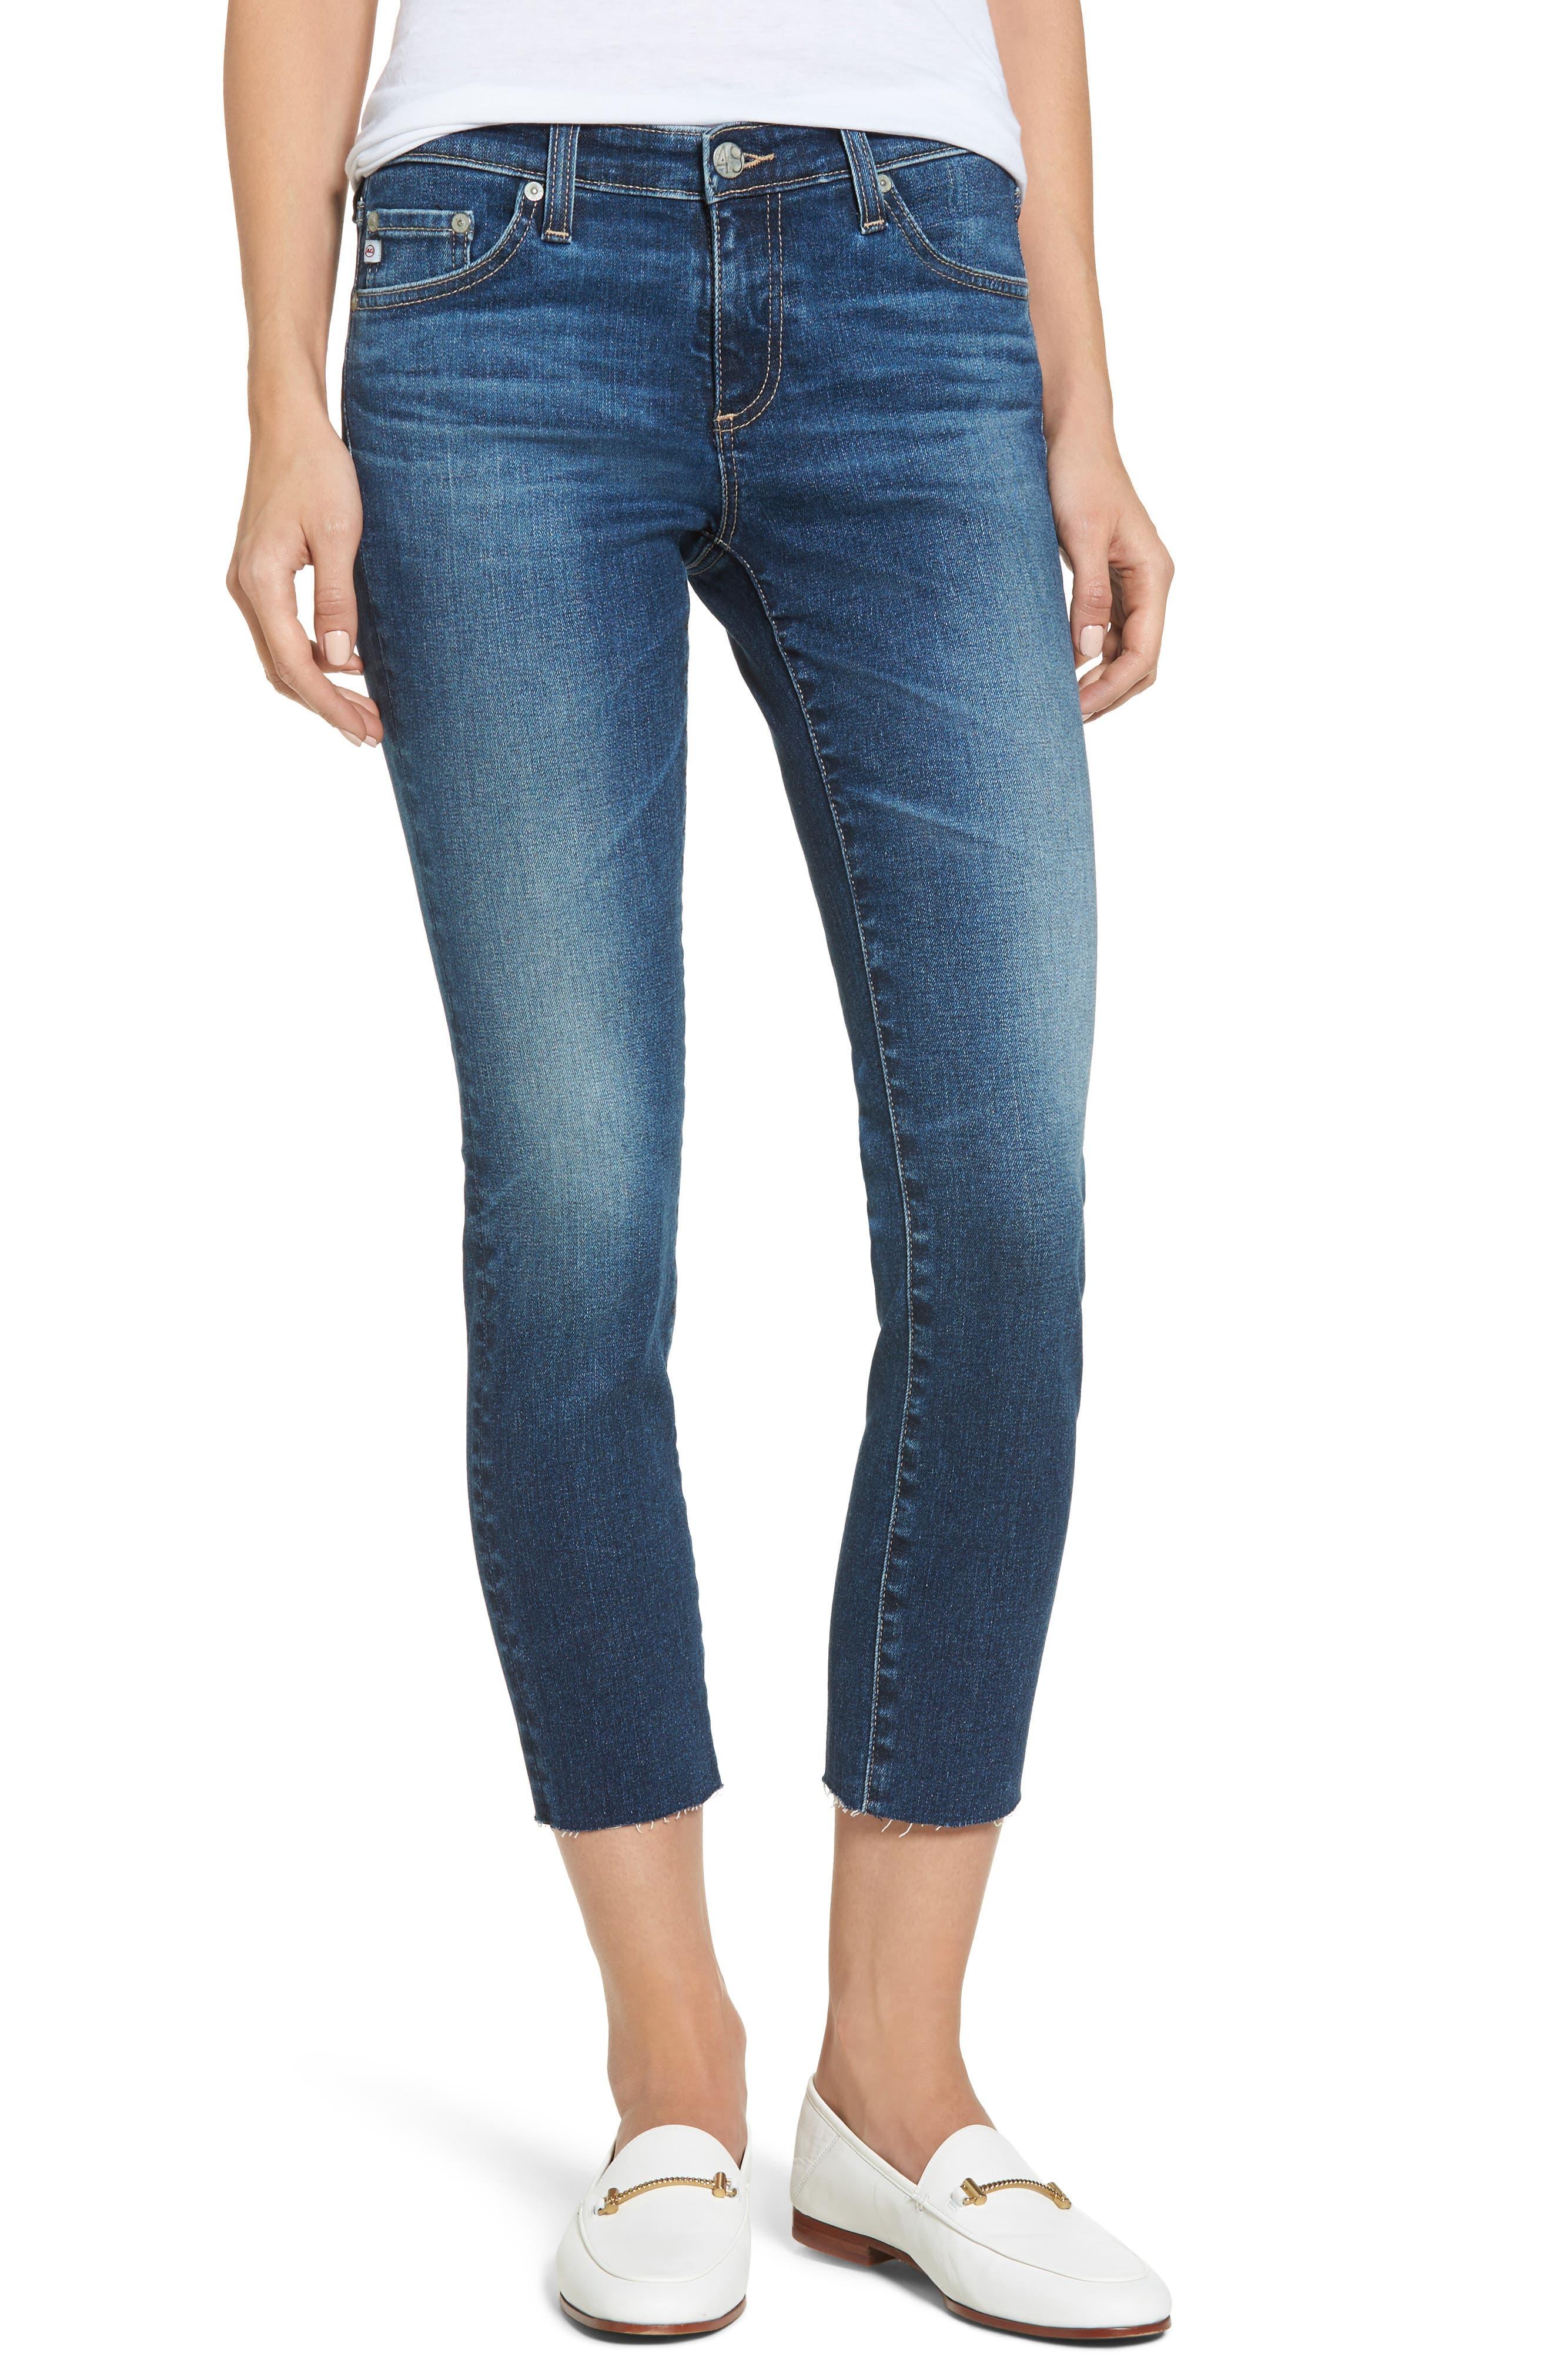 Main Image - AG The Stilt Crop Skinny Jeans (5 Years Indigo Avenue)